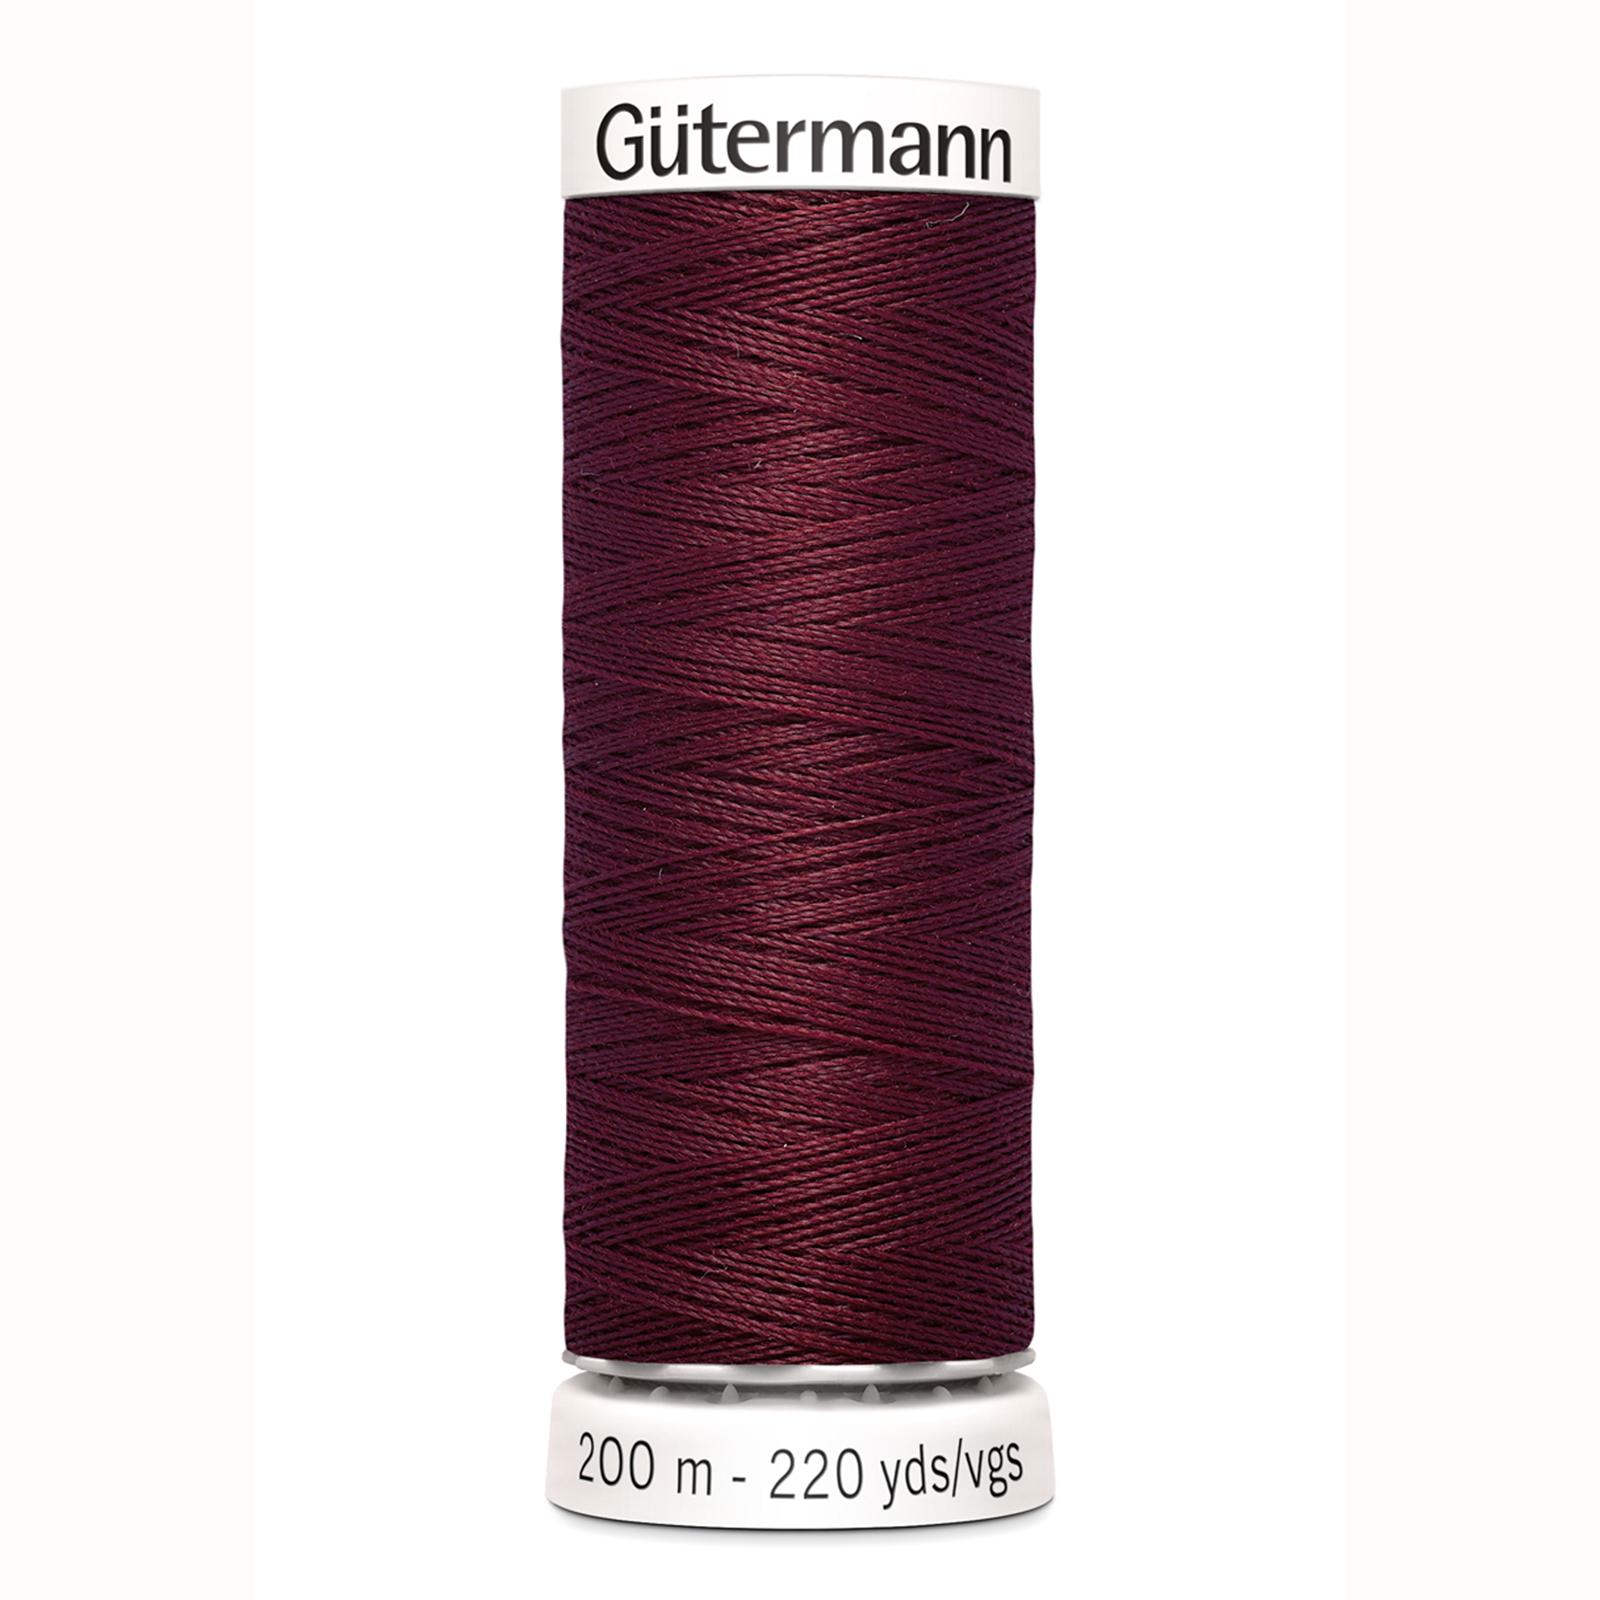 Gutermann Polyestr 200m-369